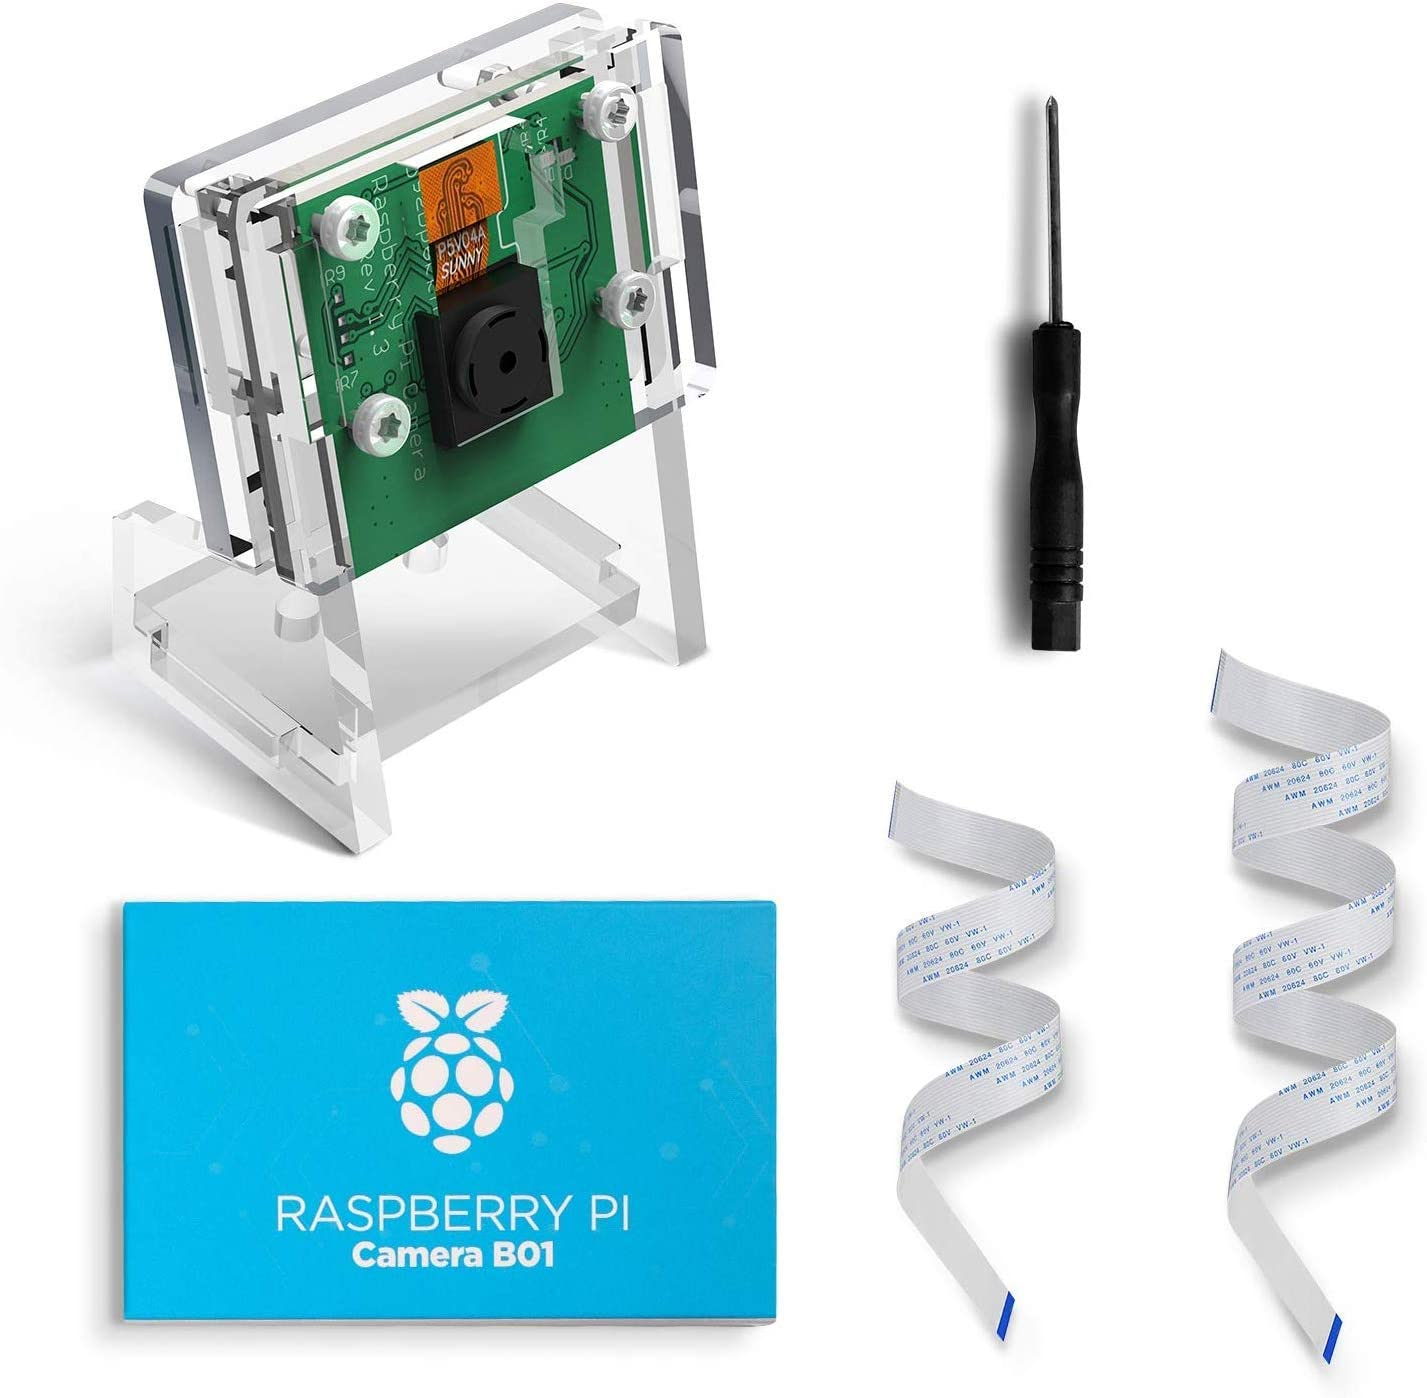 LABISTS B01 Raspberry Pi Camera Module 5M 1080P, Pi Camera avec Étui...